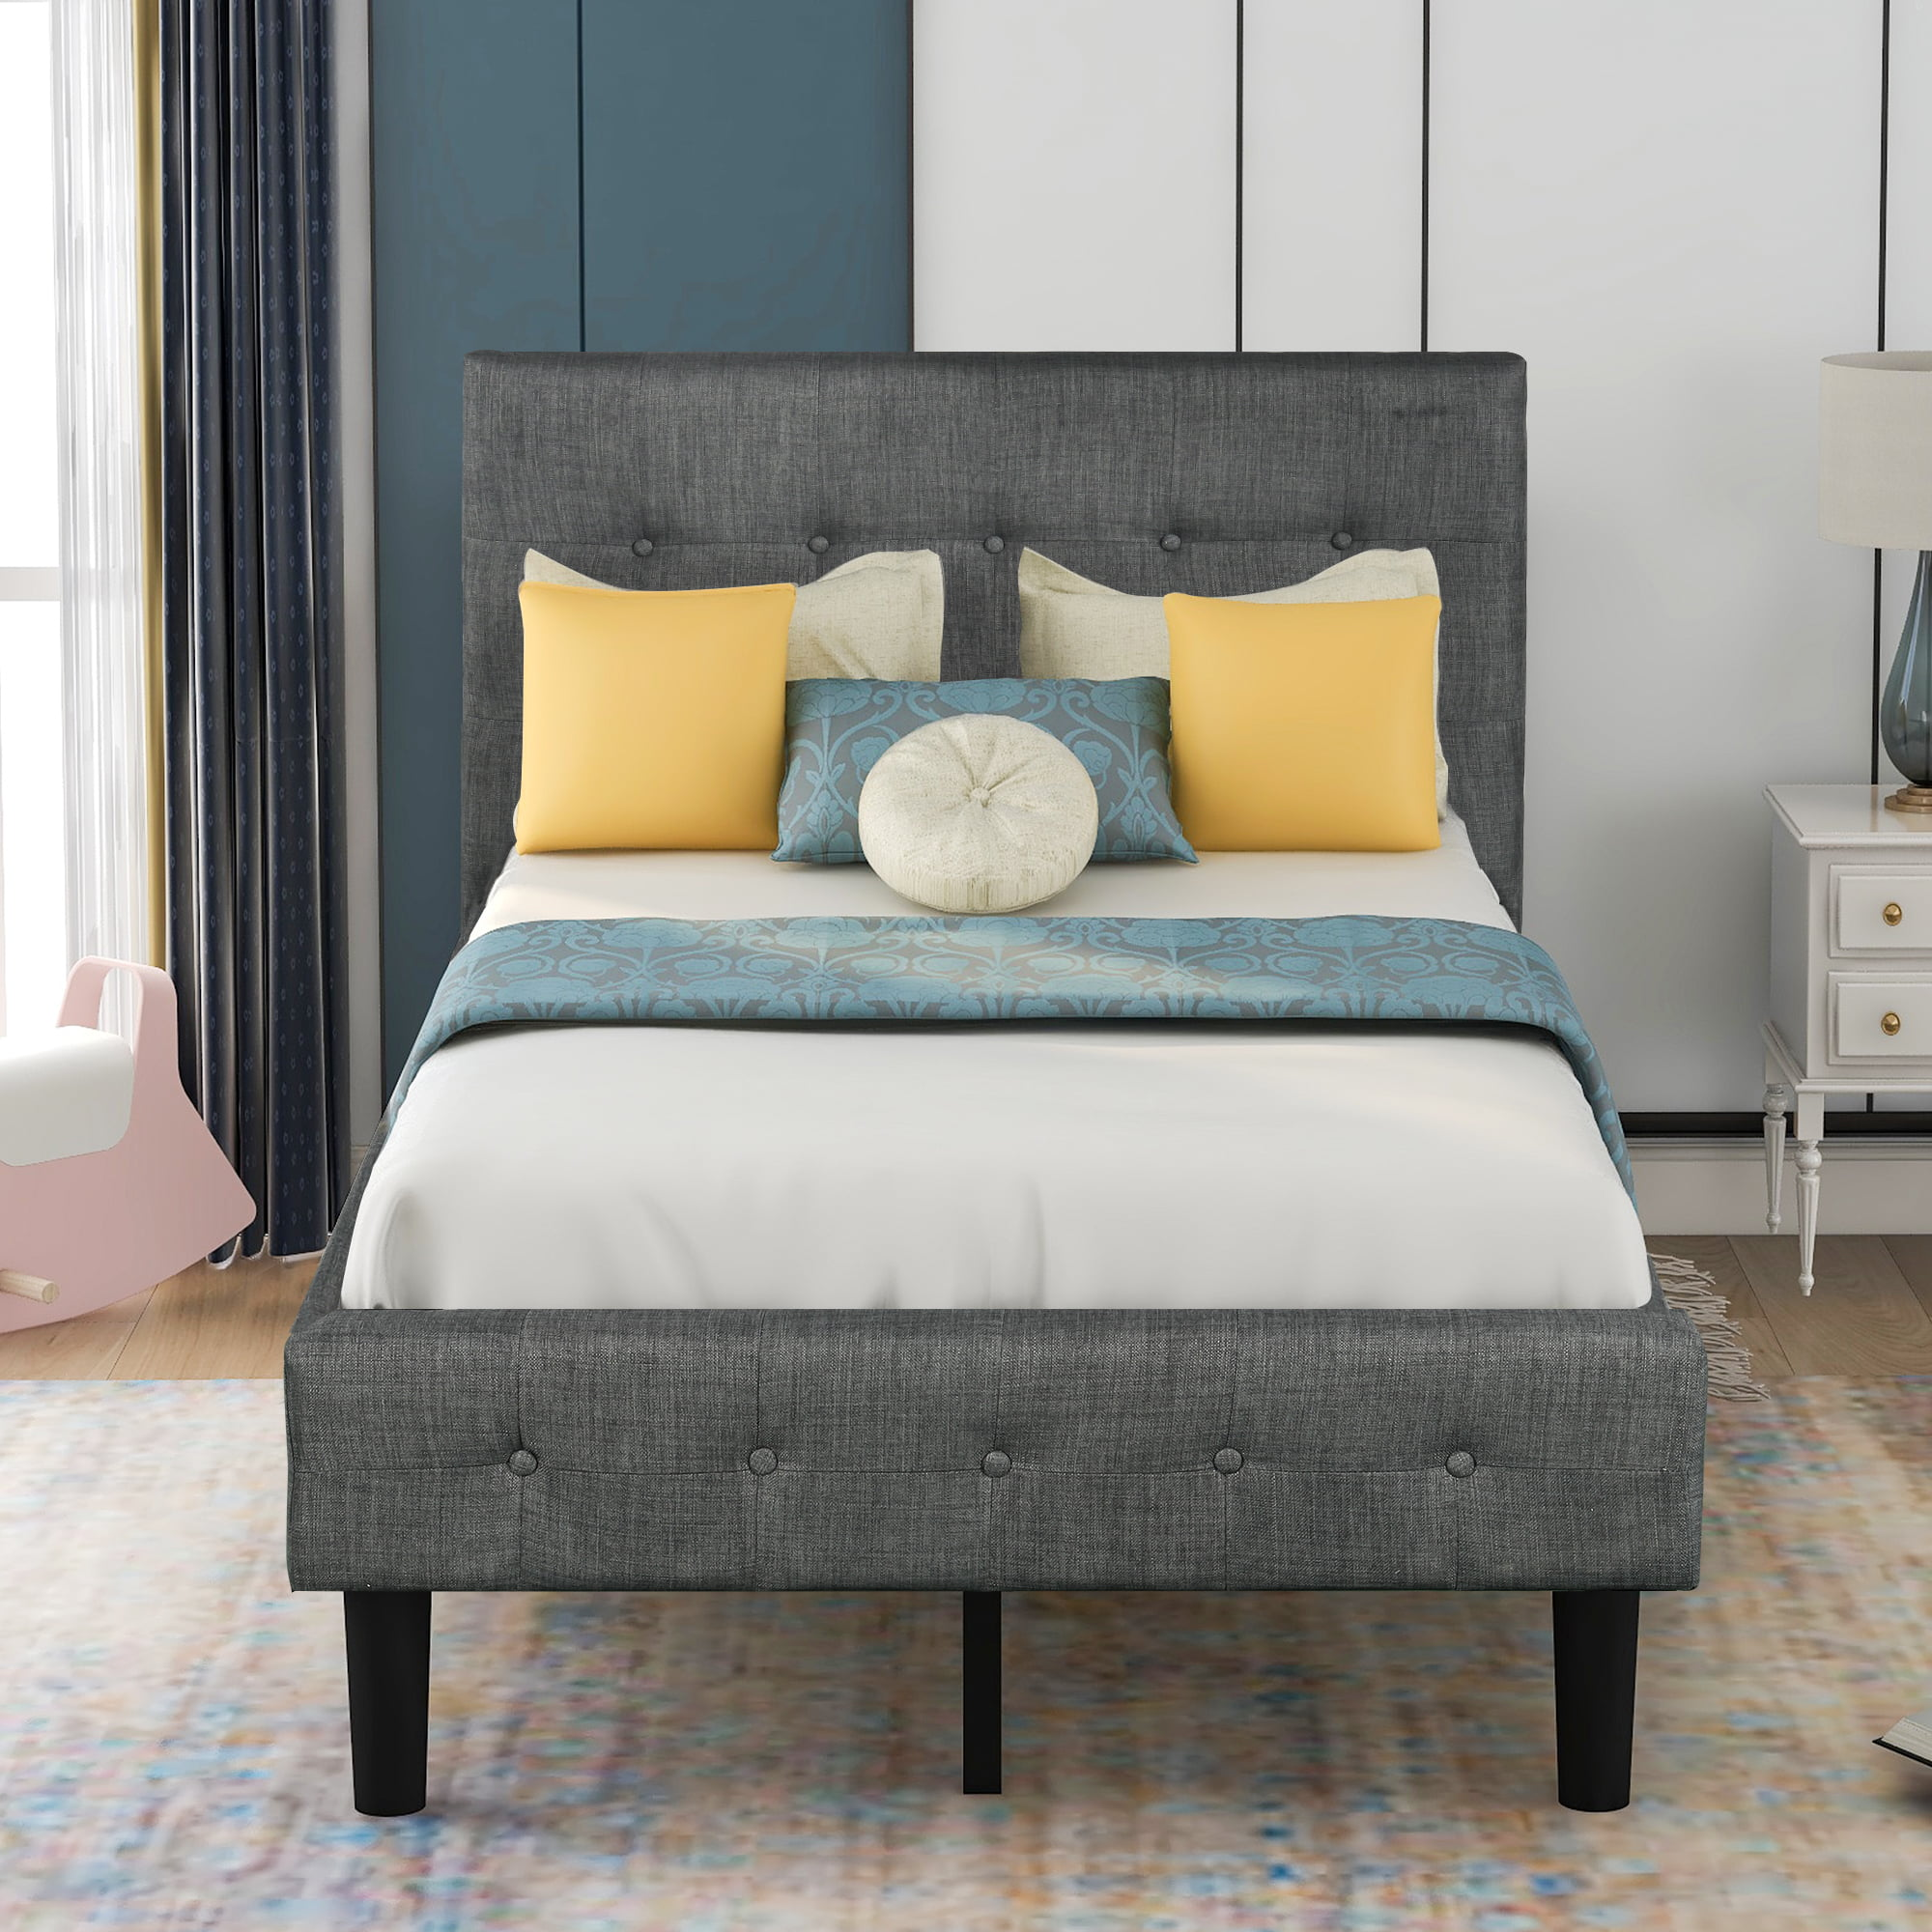 Modern Upholstered Platform Twin Bed Frame, Heavy Duty ...